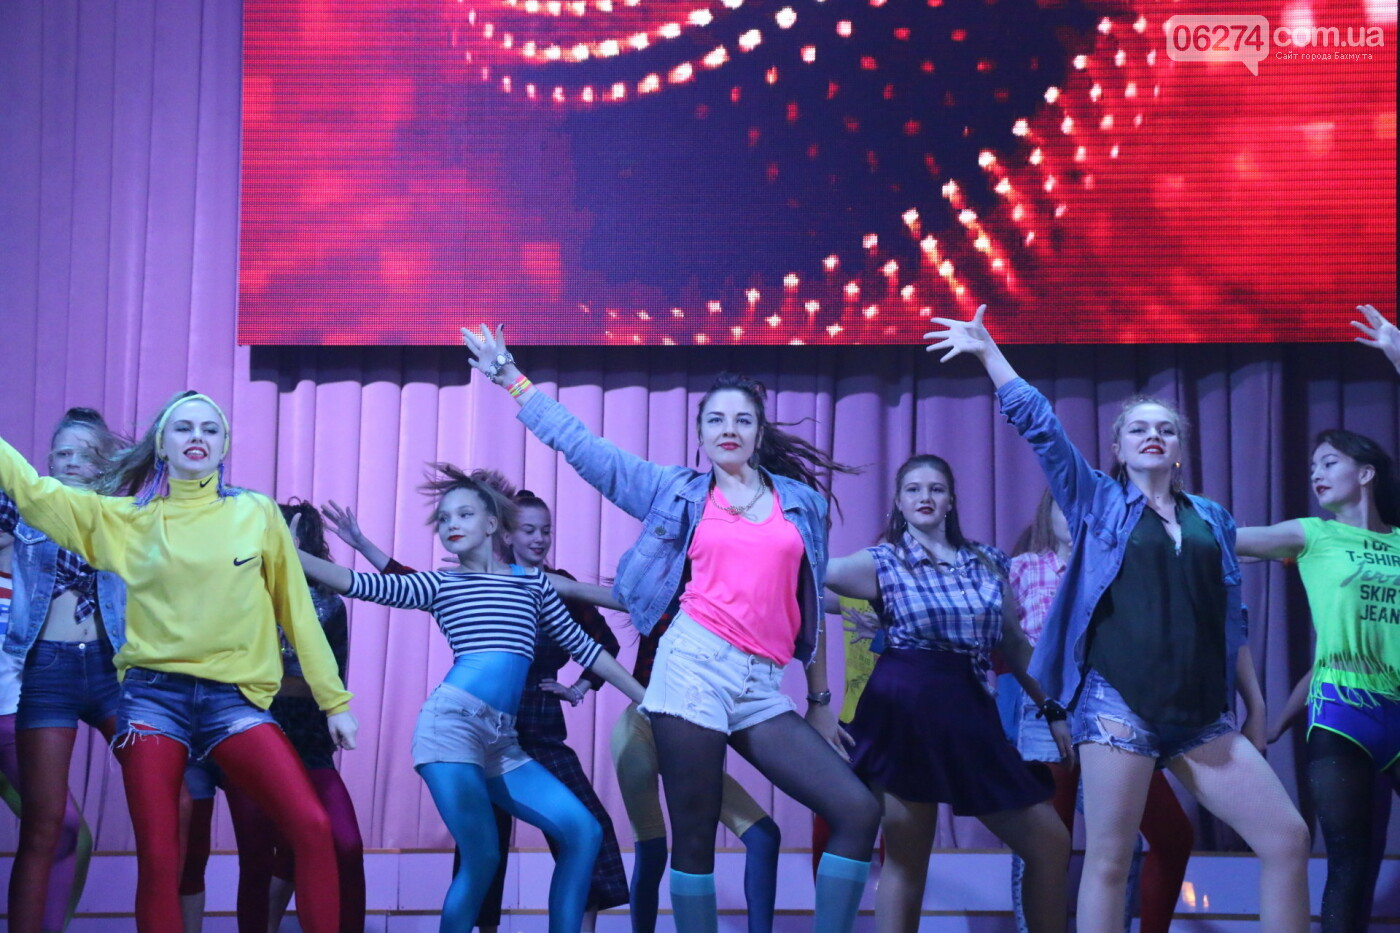 В Бахмуте провели Disco House Party (ФОТООТЧЕТ), фото-24